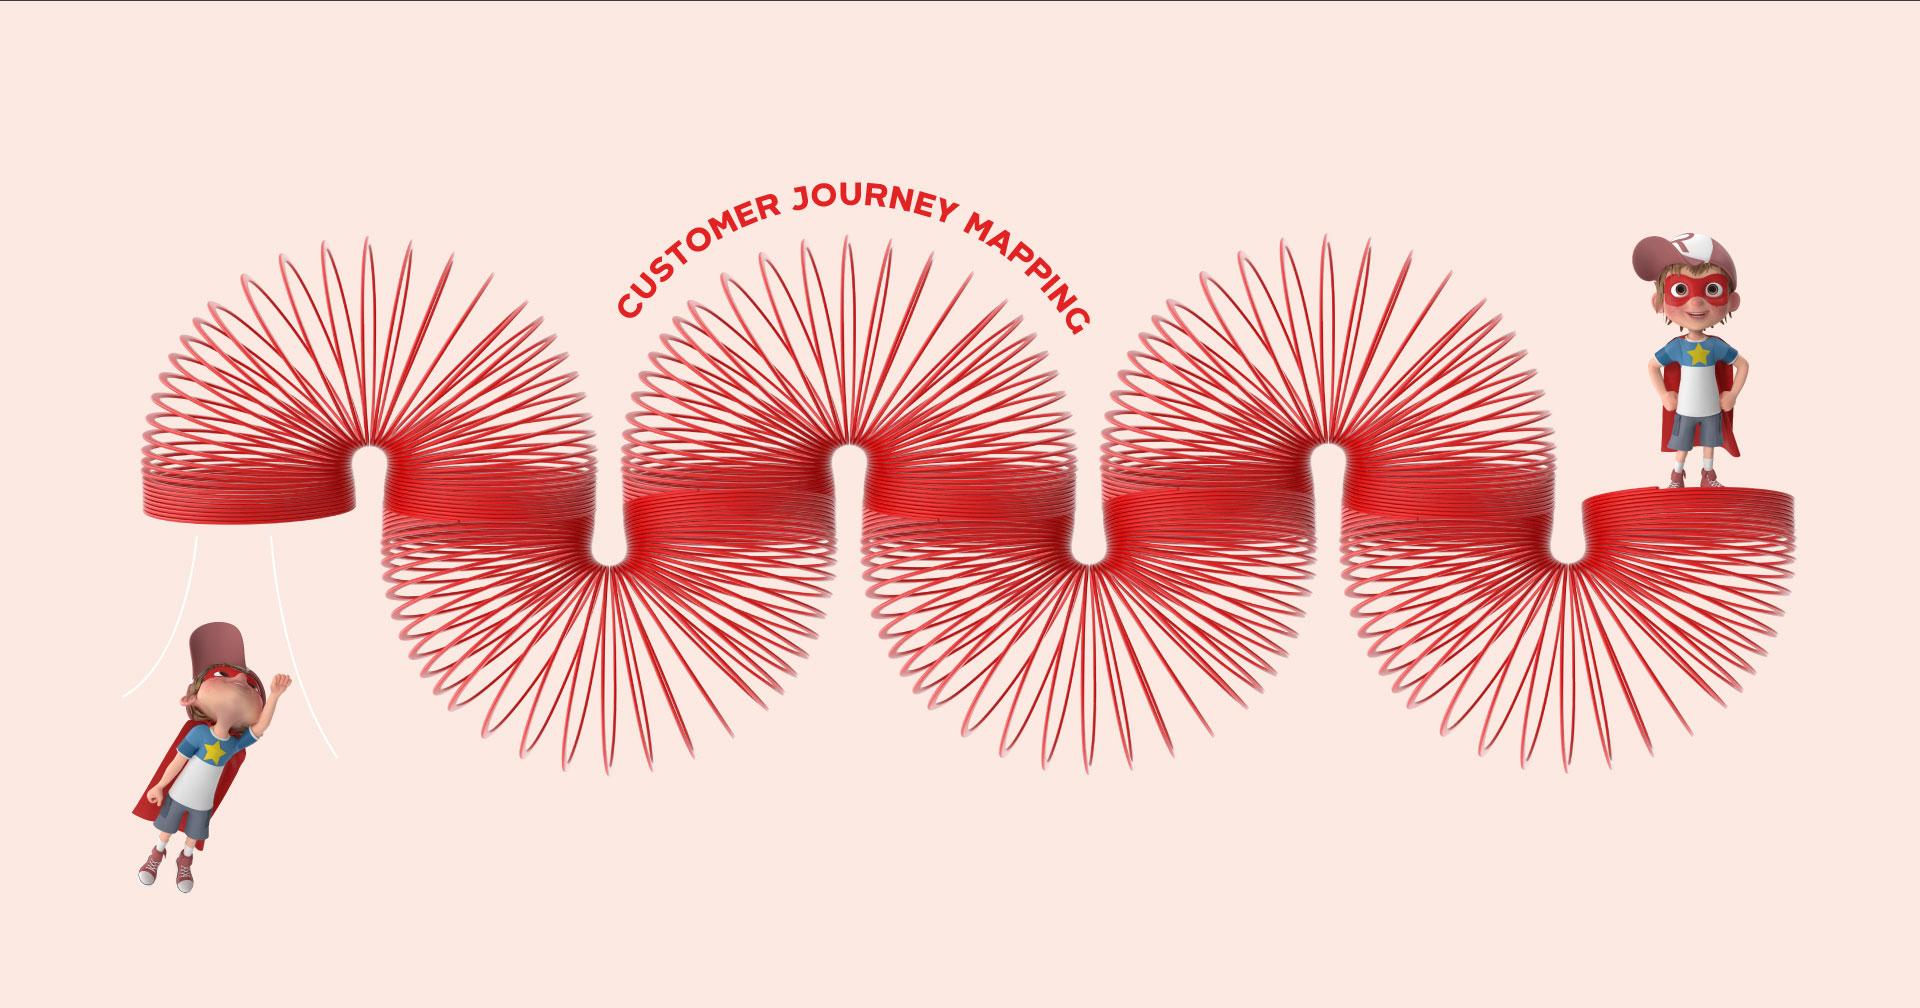 PulsAero customer journey map